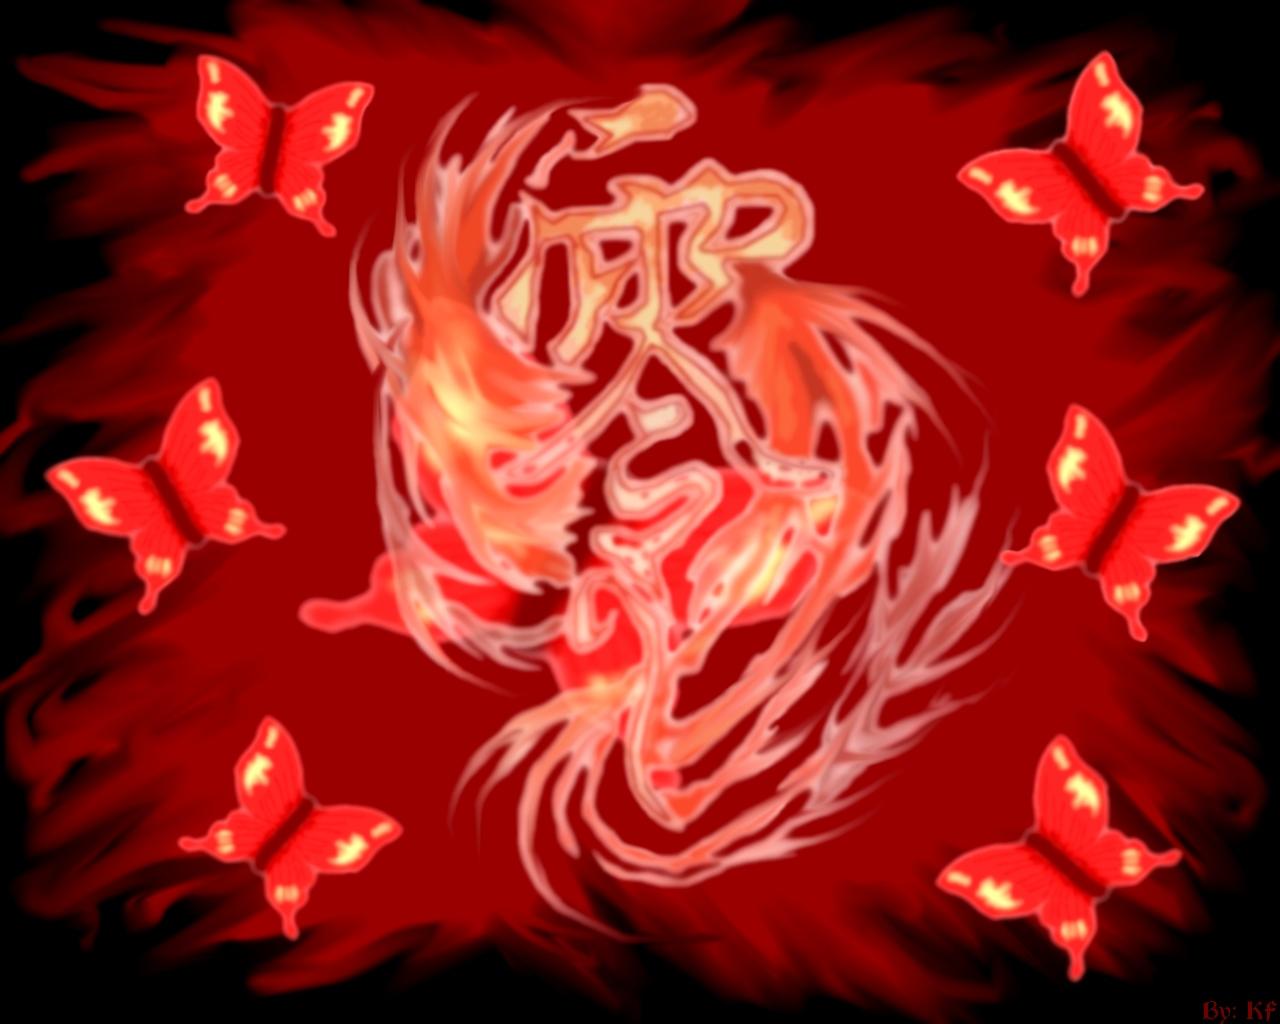 http://3.bp.blogspot.com/-OWWUIUe1ddA/T8pmiR98RtI/AAAAAAAAMII/kLEZlmF7fGY/s1600/crimson_butterfly_wallpaper_by_kisufairy-d32oiut.jpg